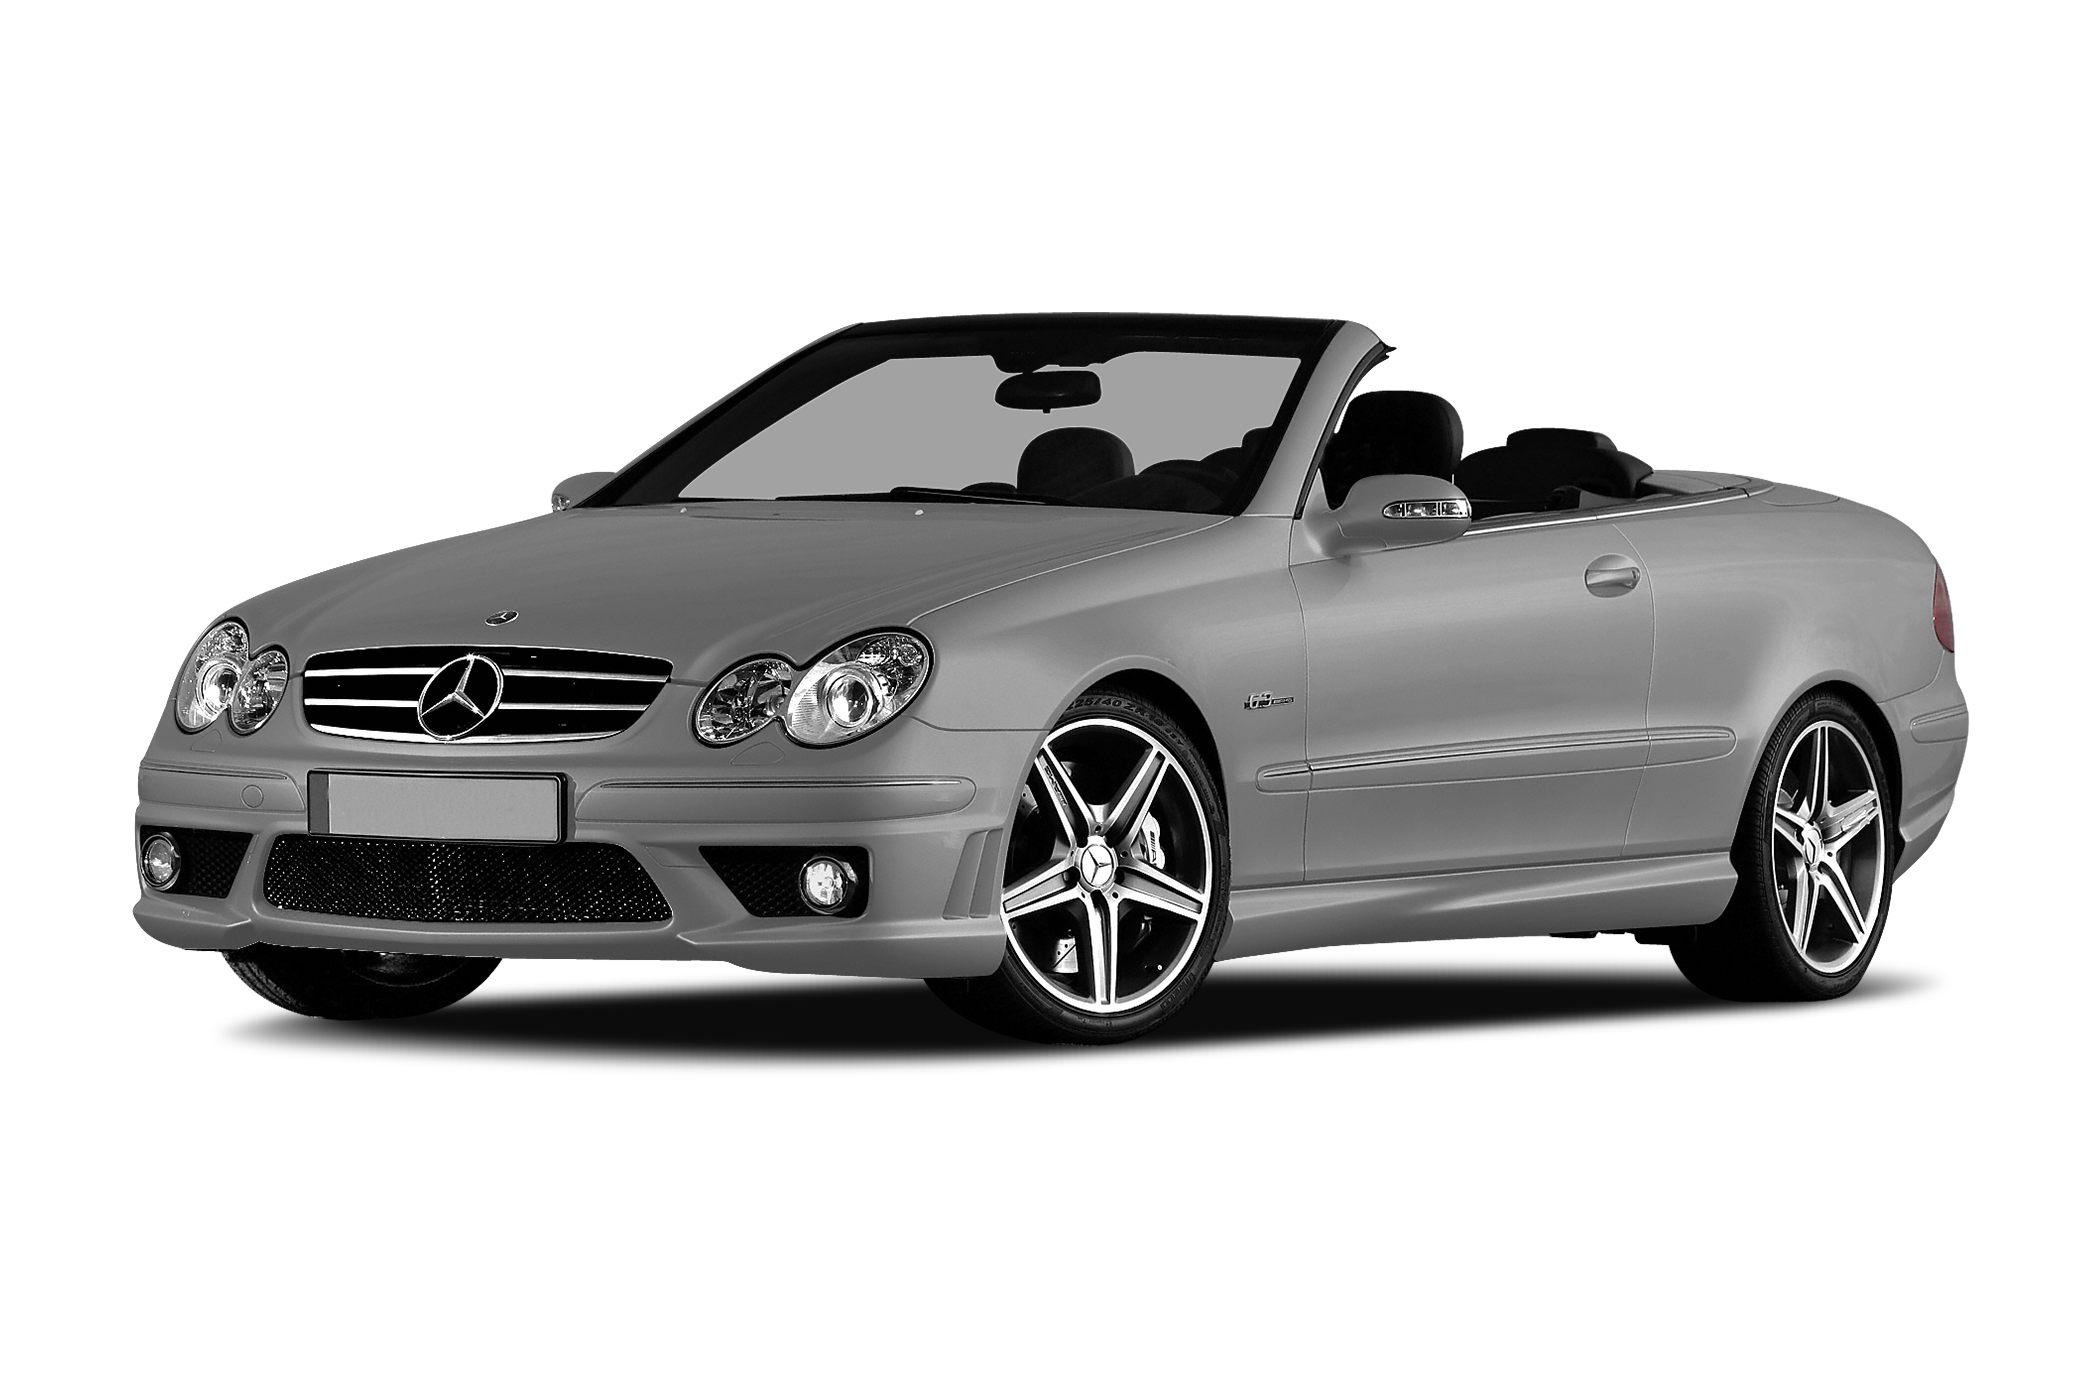 2007 Mercedes Benz CLK Class Base CLK 550 2dr Convertible Pricing